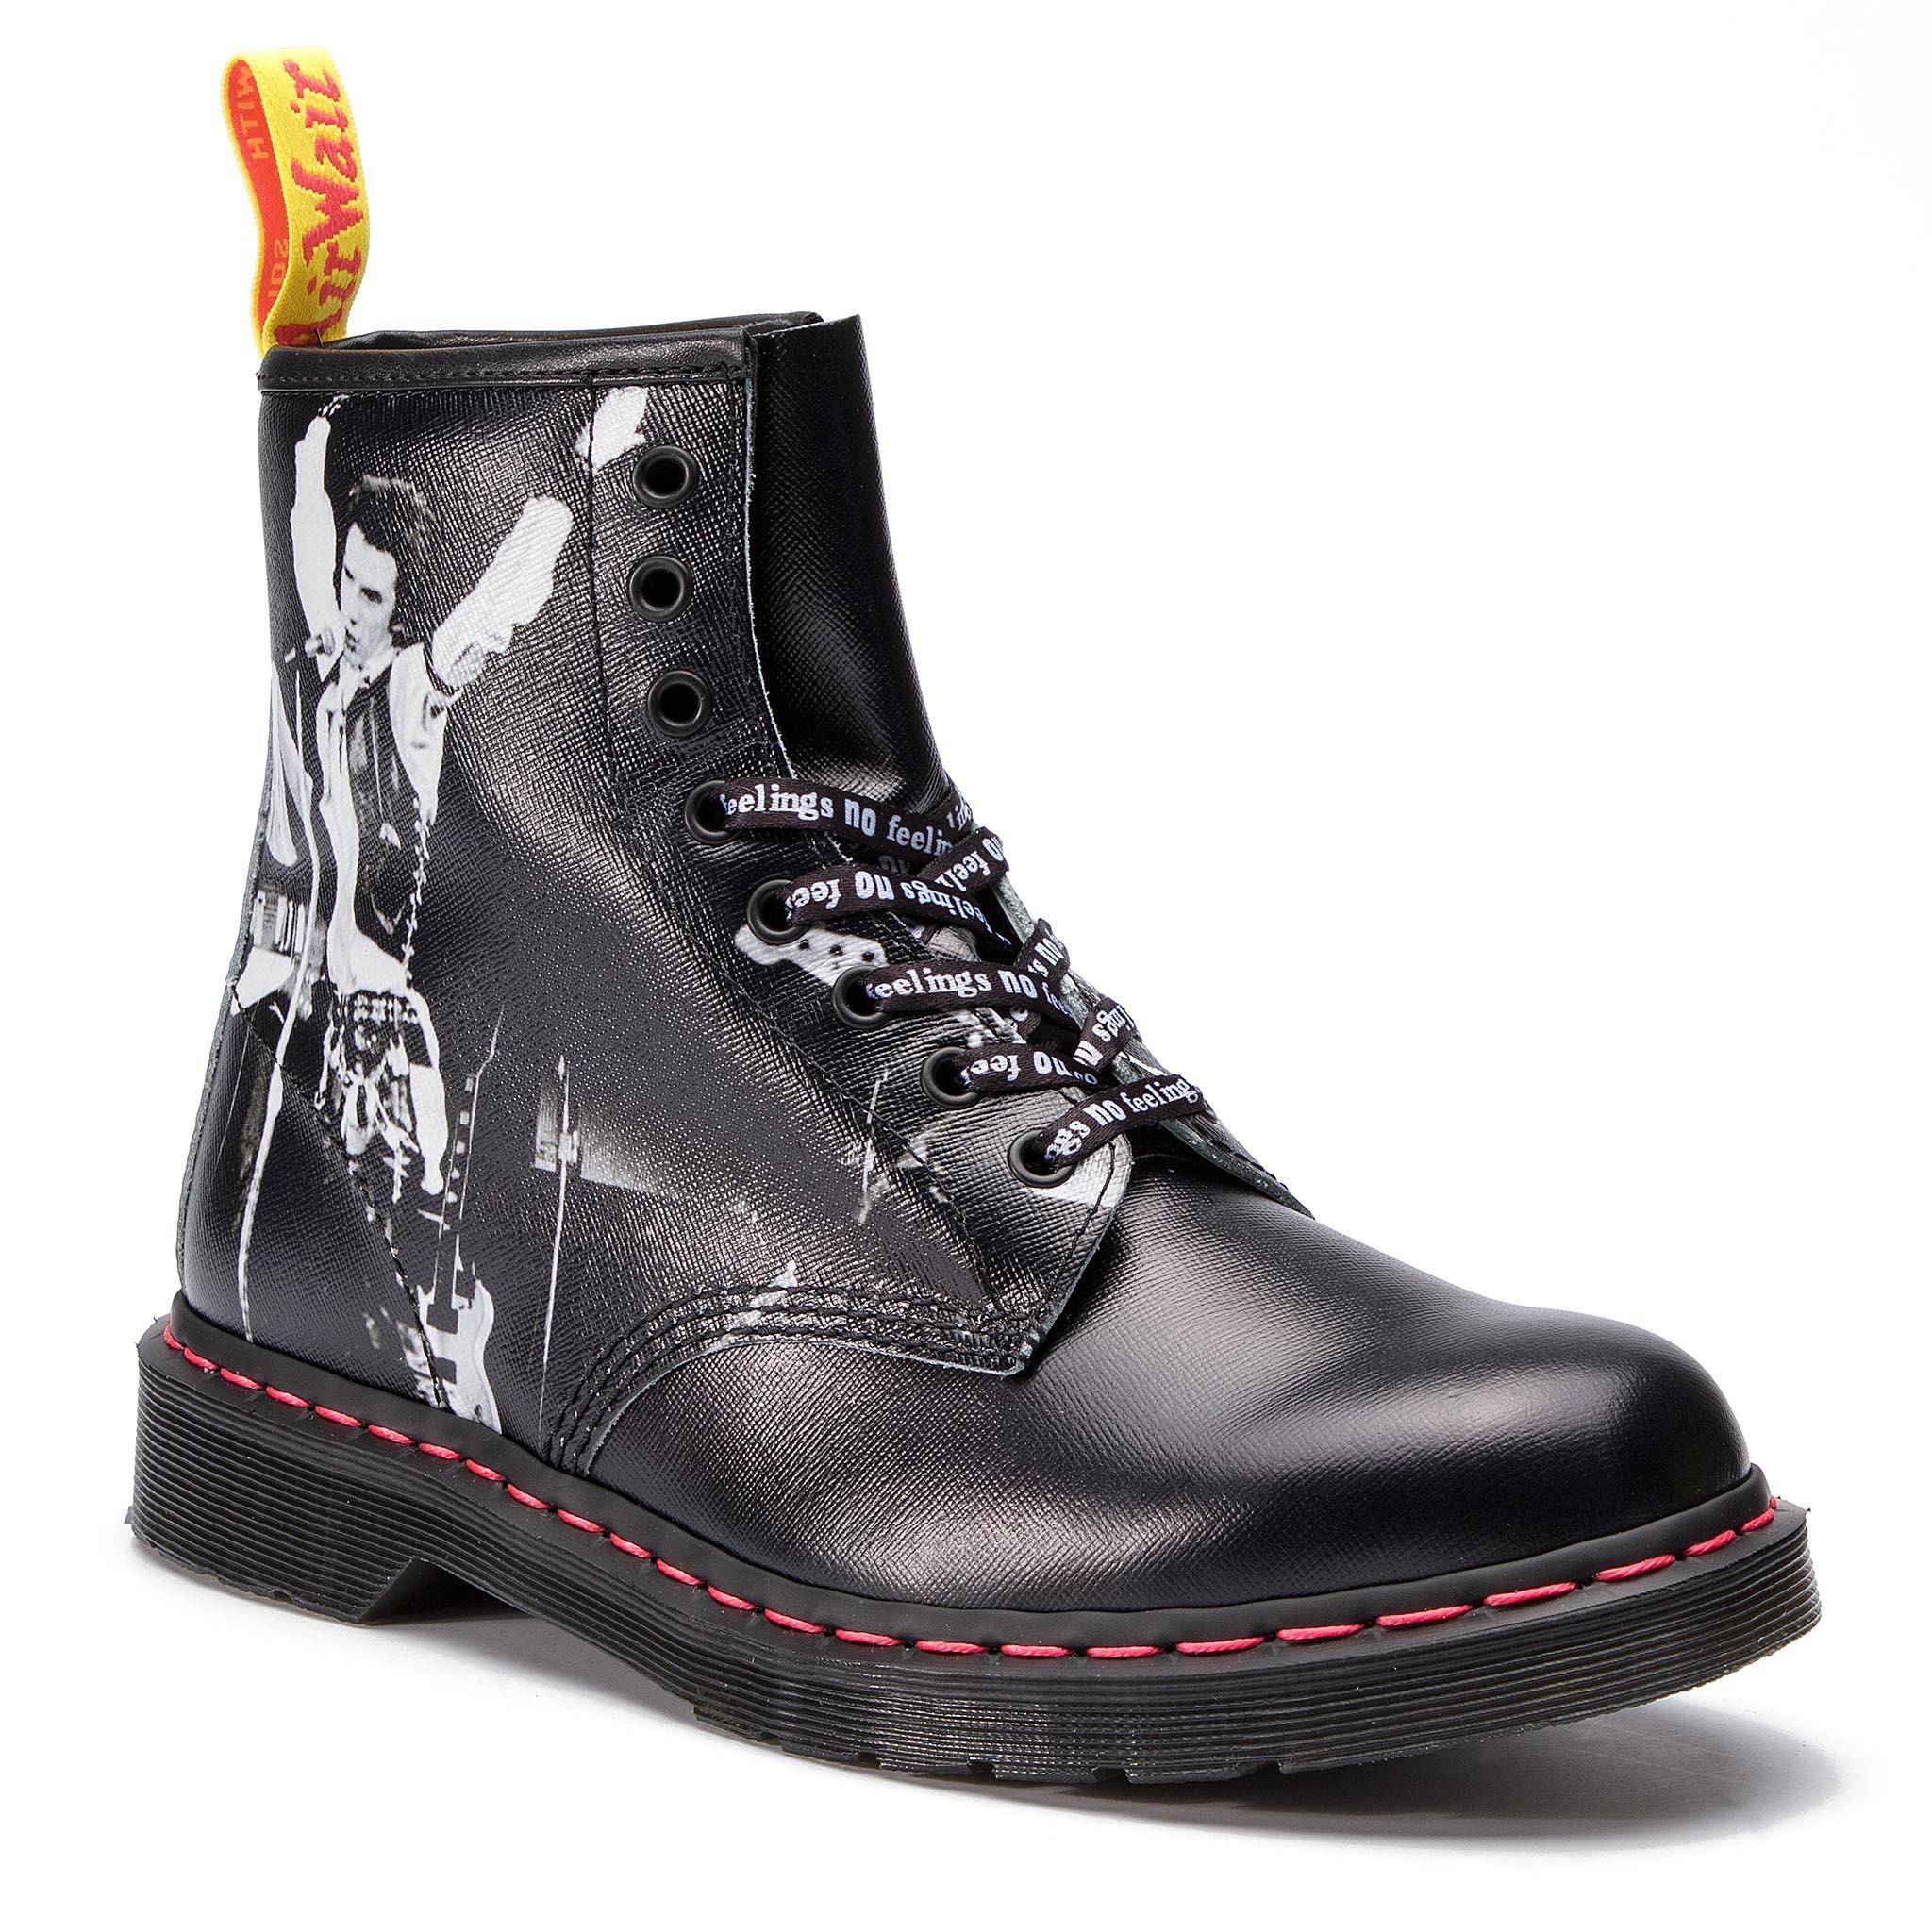 8200a3940bfa Combat Boots DR. MARTENS. 1460 Pascal Glitter 24839602 Red/ Fine Glitter